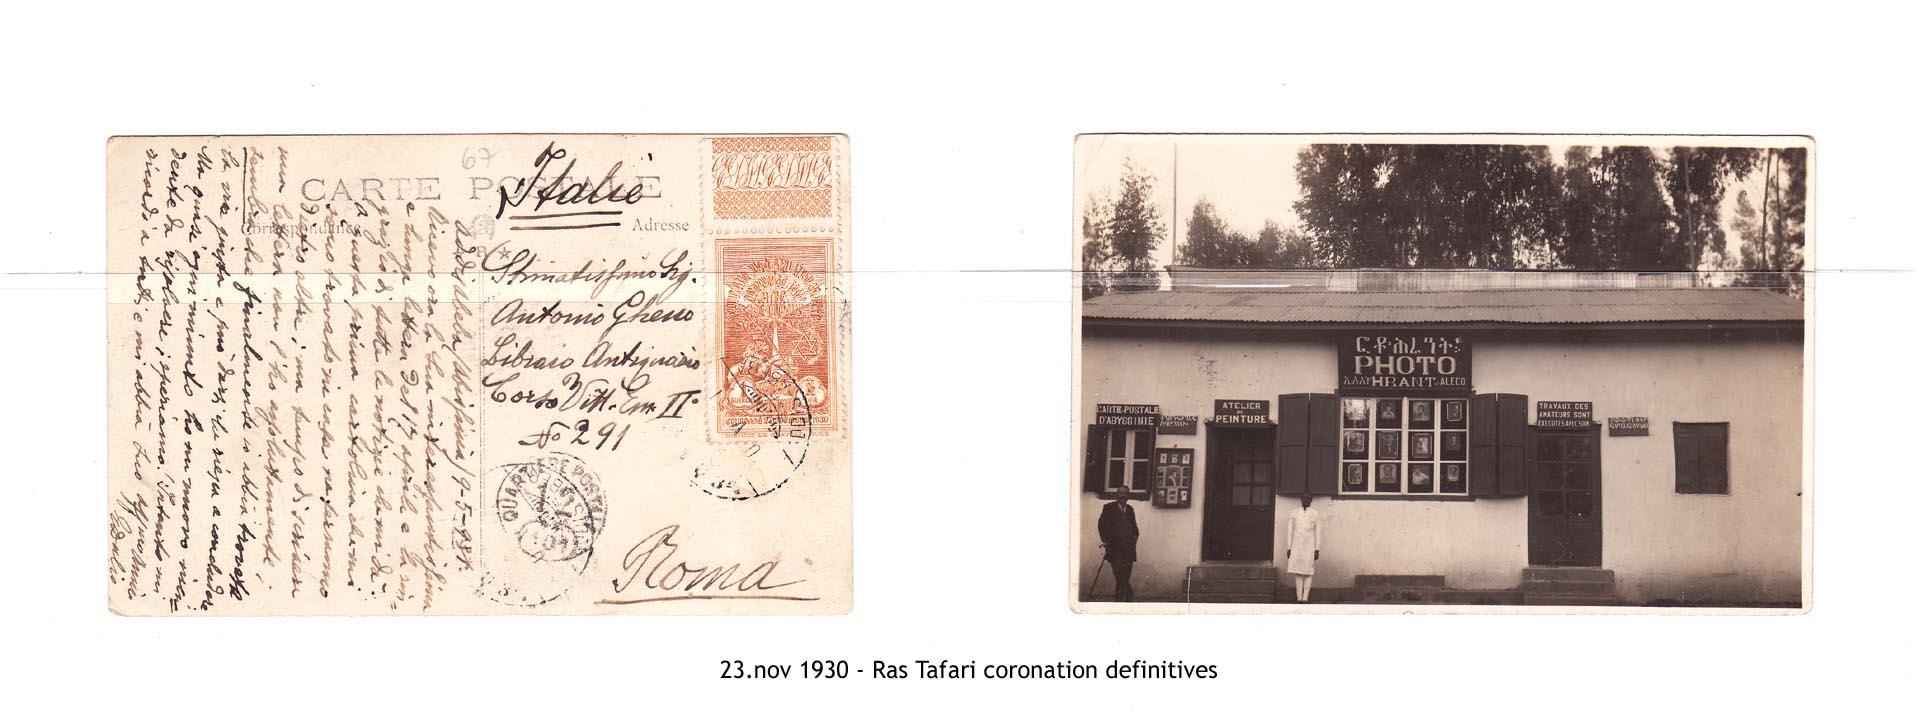 19301122 - Ras Tafari coronation definitives